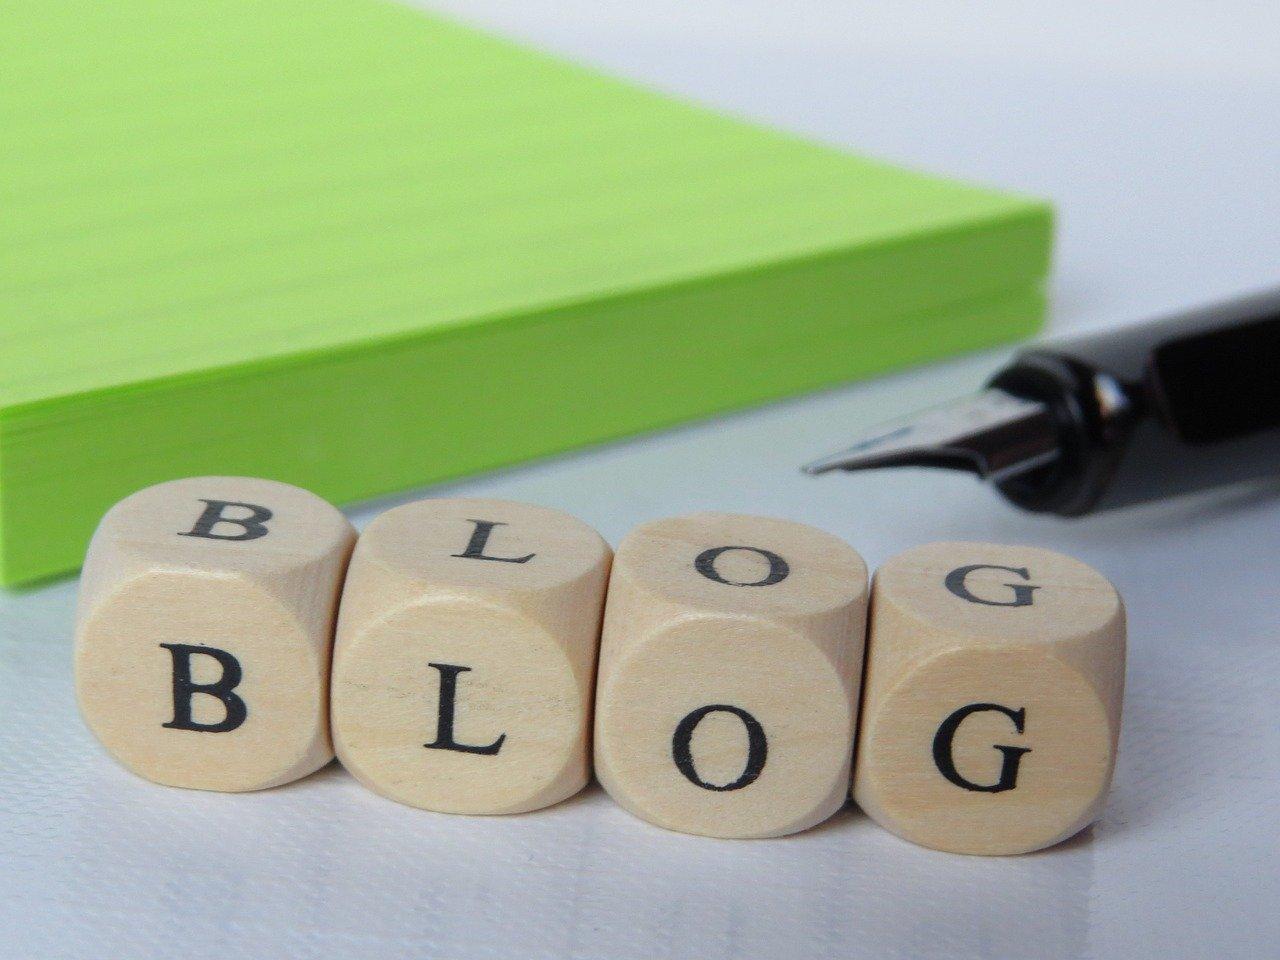 Création d'un site Internet Bayonne avec WordPress